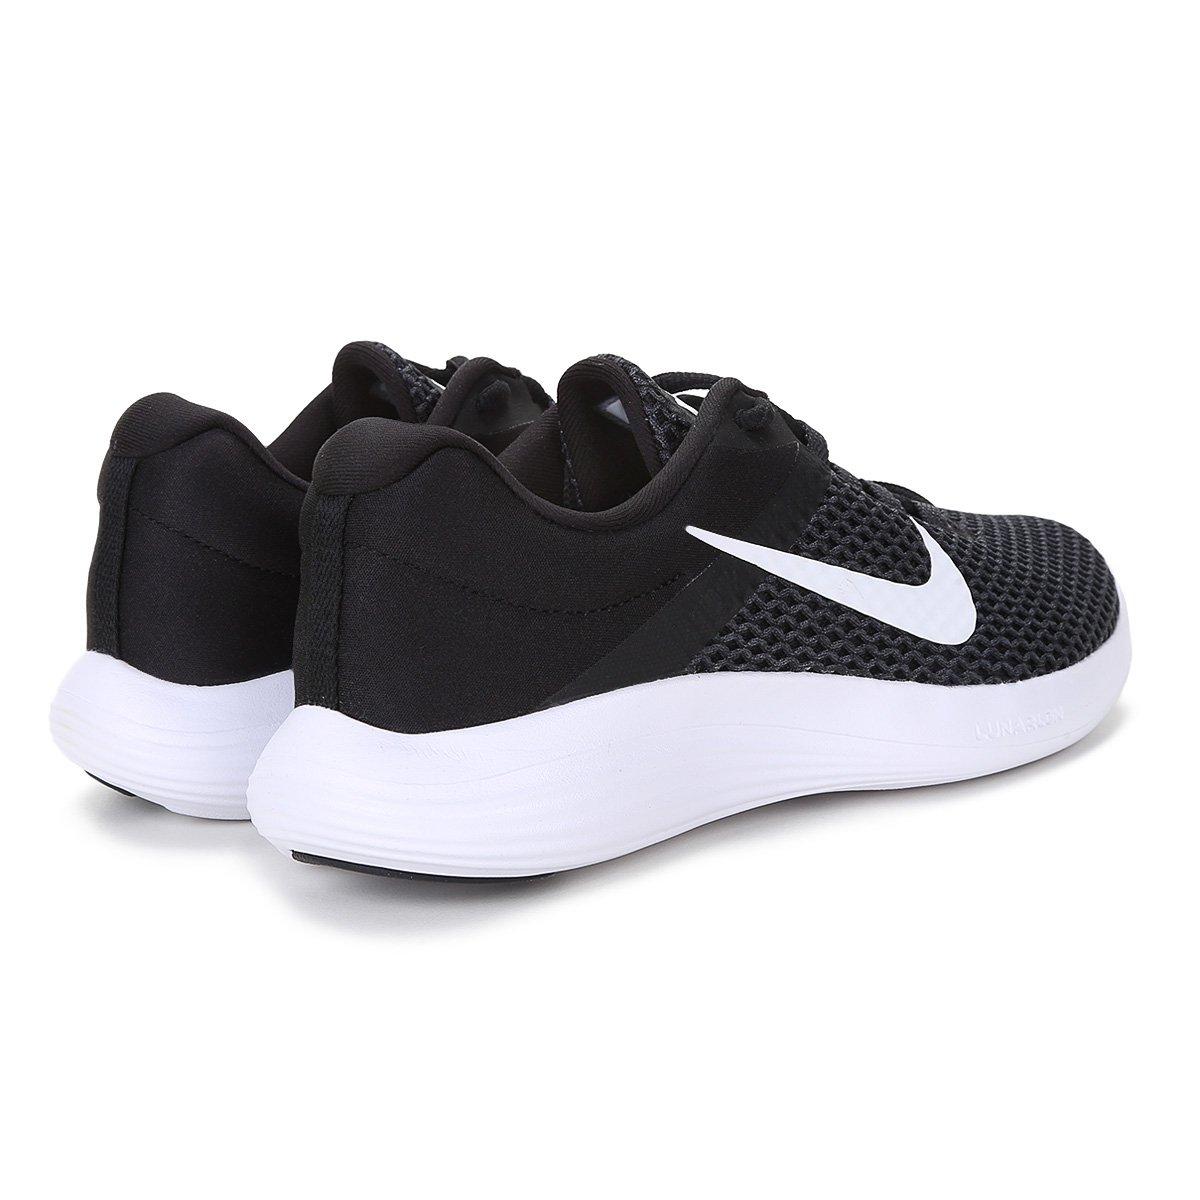 Tênis Nike Lunarconverge 2 Feminino - Preto e Branco